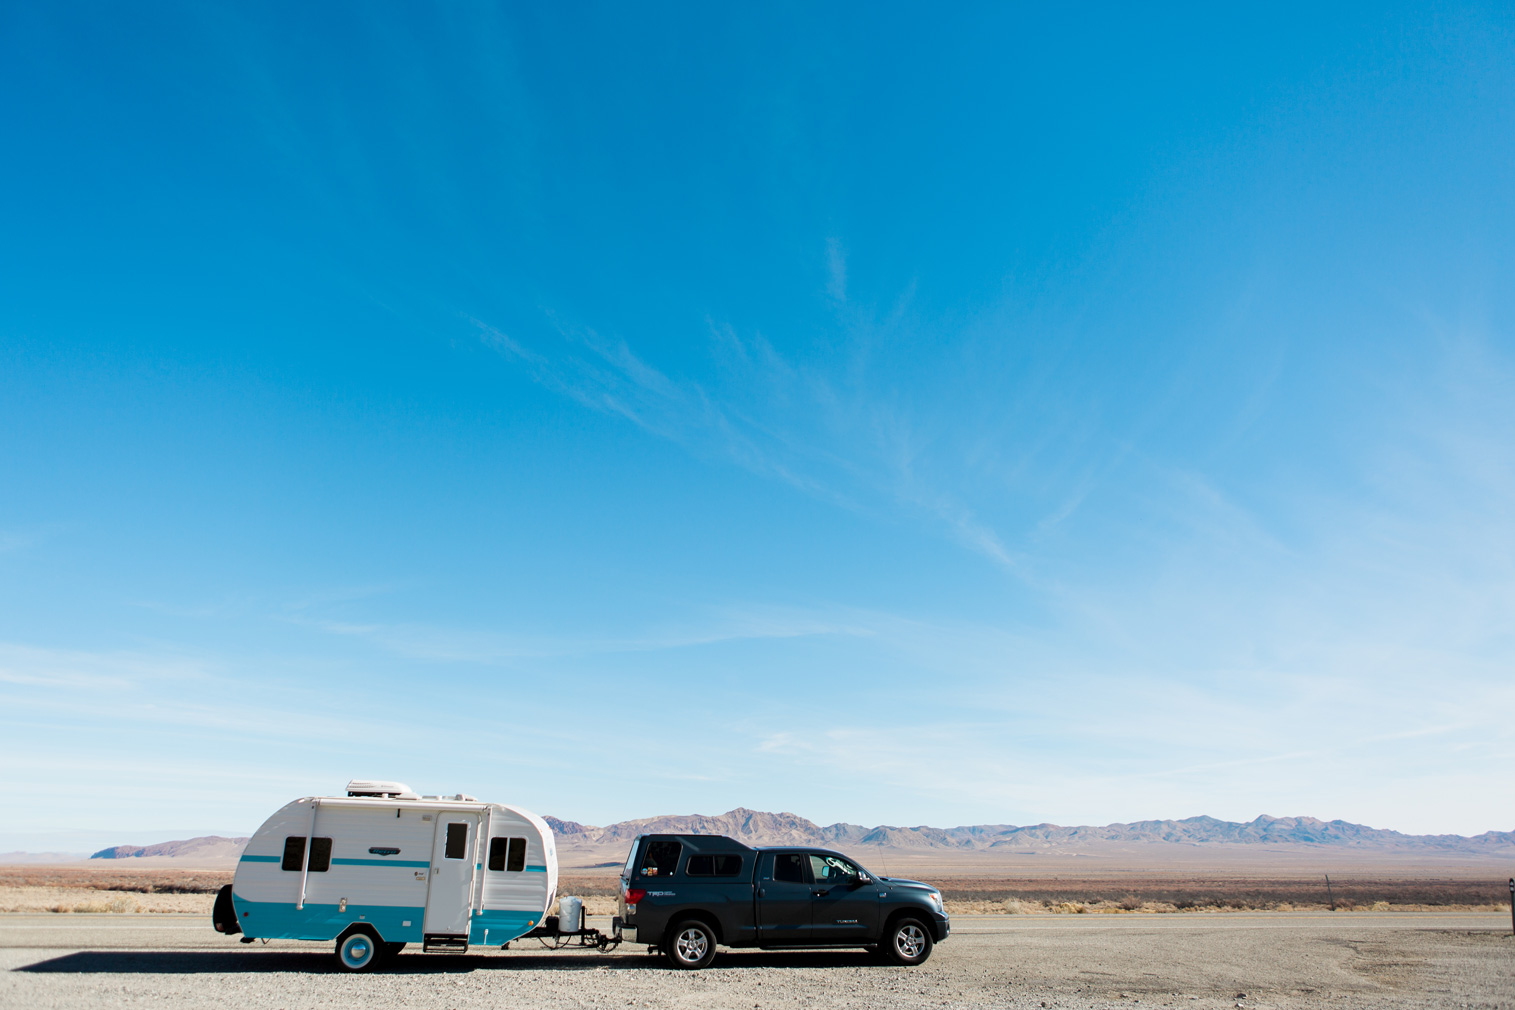 CindyGiovagnoli_Great_Sand_Dunes_Zion_National_Park_Horseshoe_Bend_Truck_Camping_Toyota_The_Narrows_roadtrip_Utah_Colorado-009.jpg